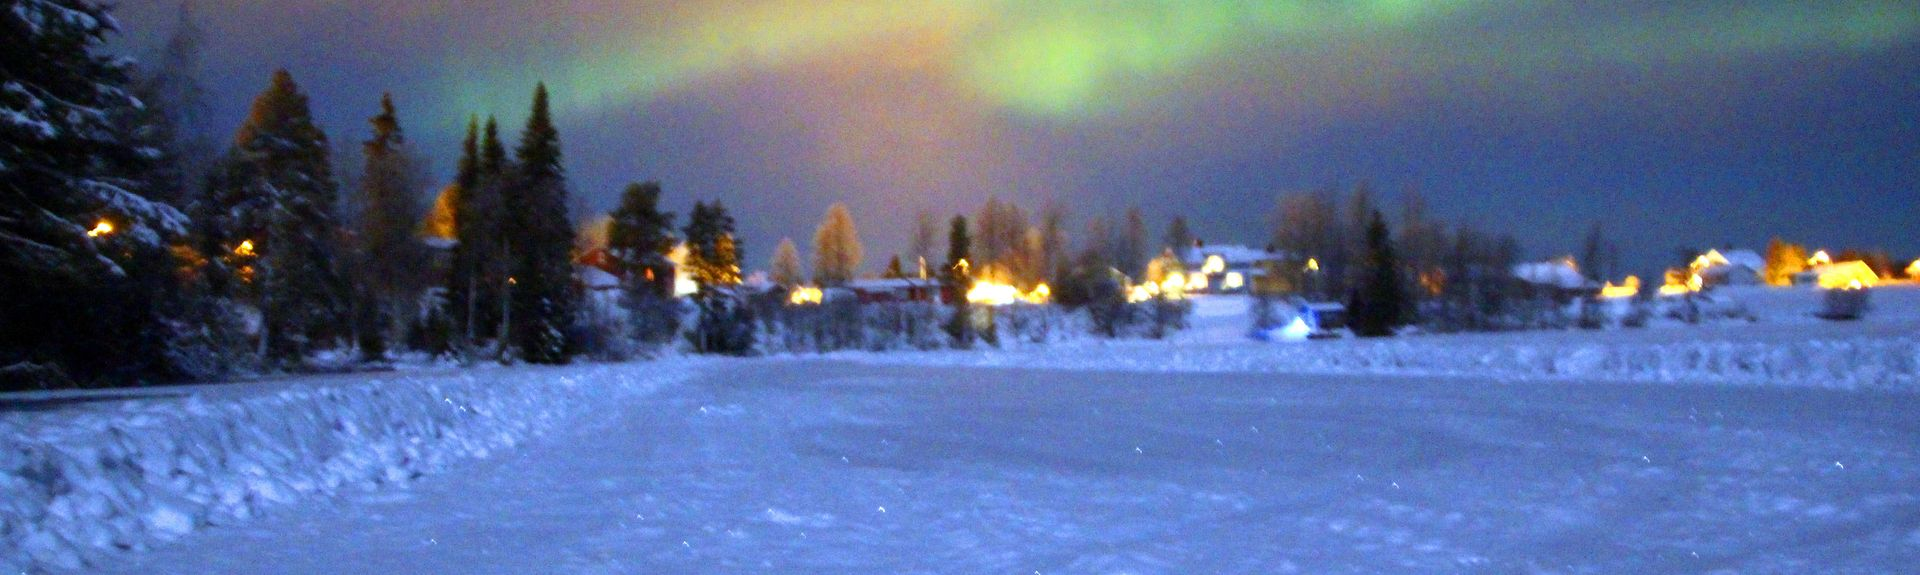 Norrbotten (provincie), Zweden